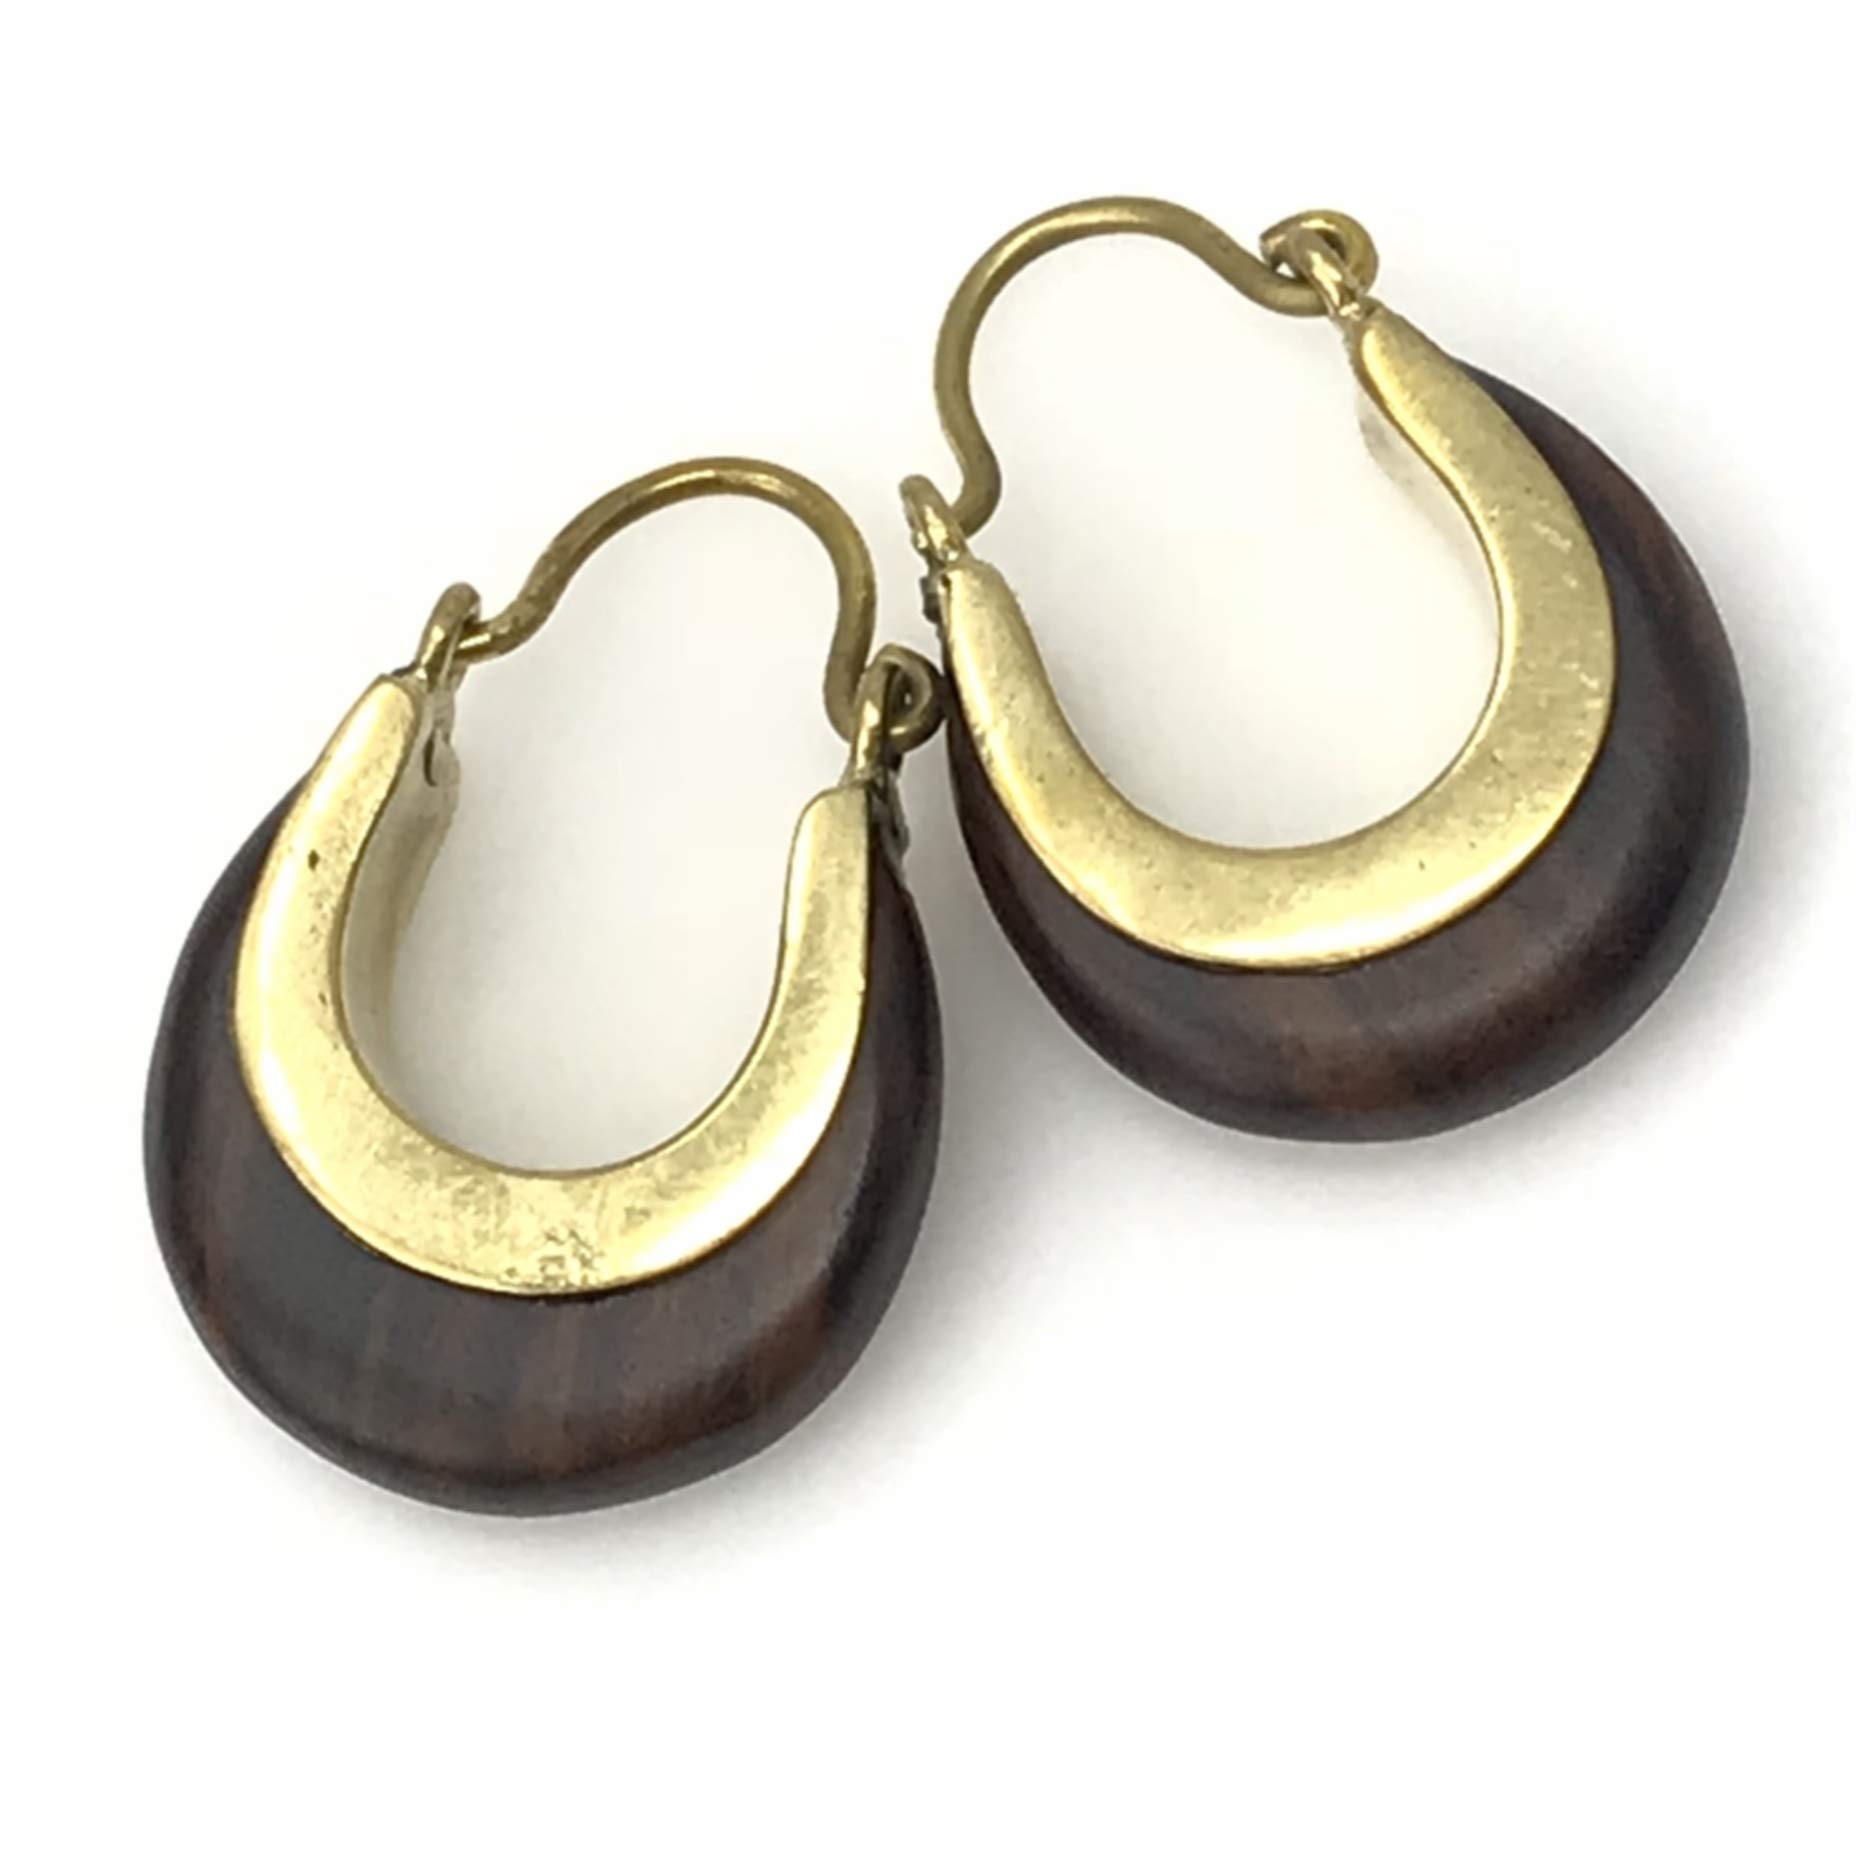 UMBRELLALABORATORY Tribal Organics Earrings Wooden Brass Tropical Bohemian organic SOLD AS PAIR W 1a